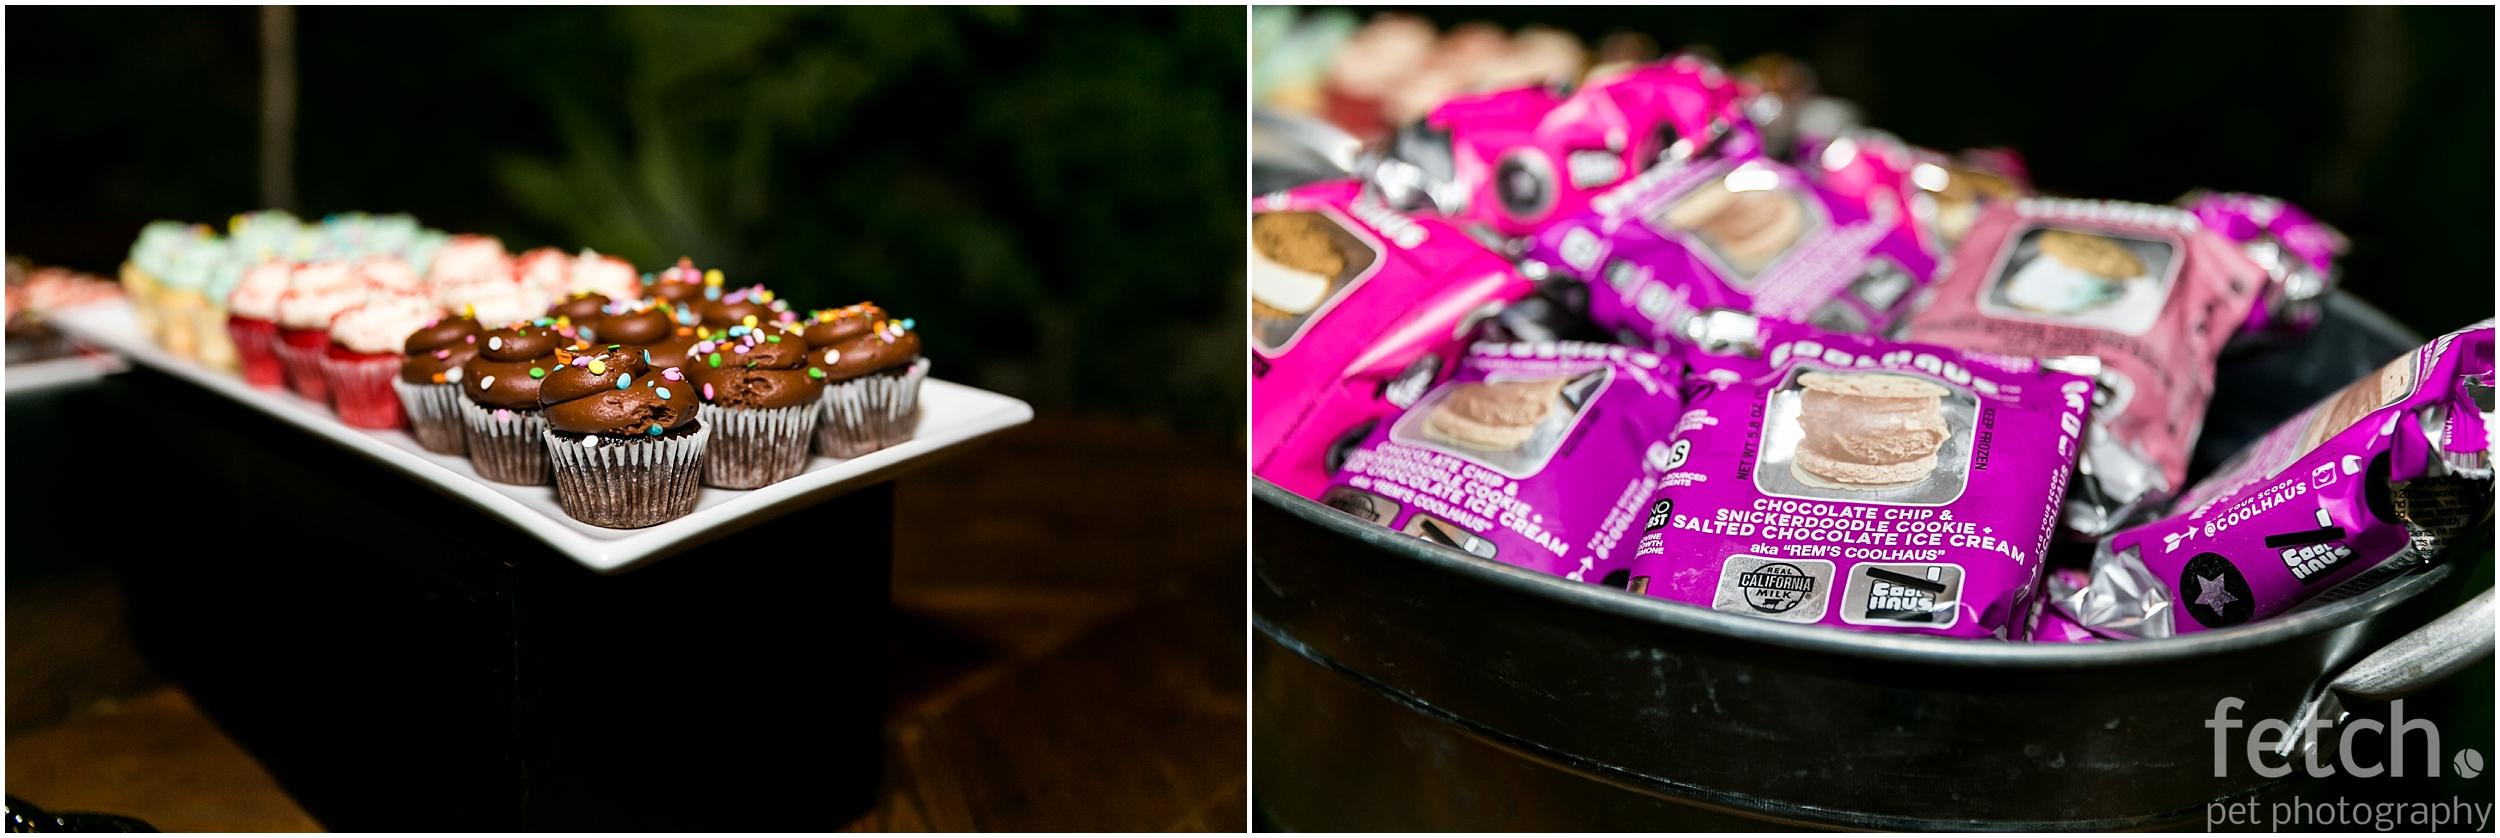 susie-cakes-coolhaus